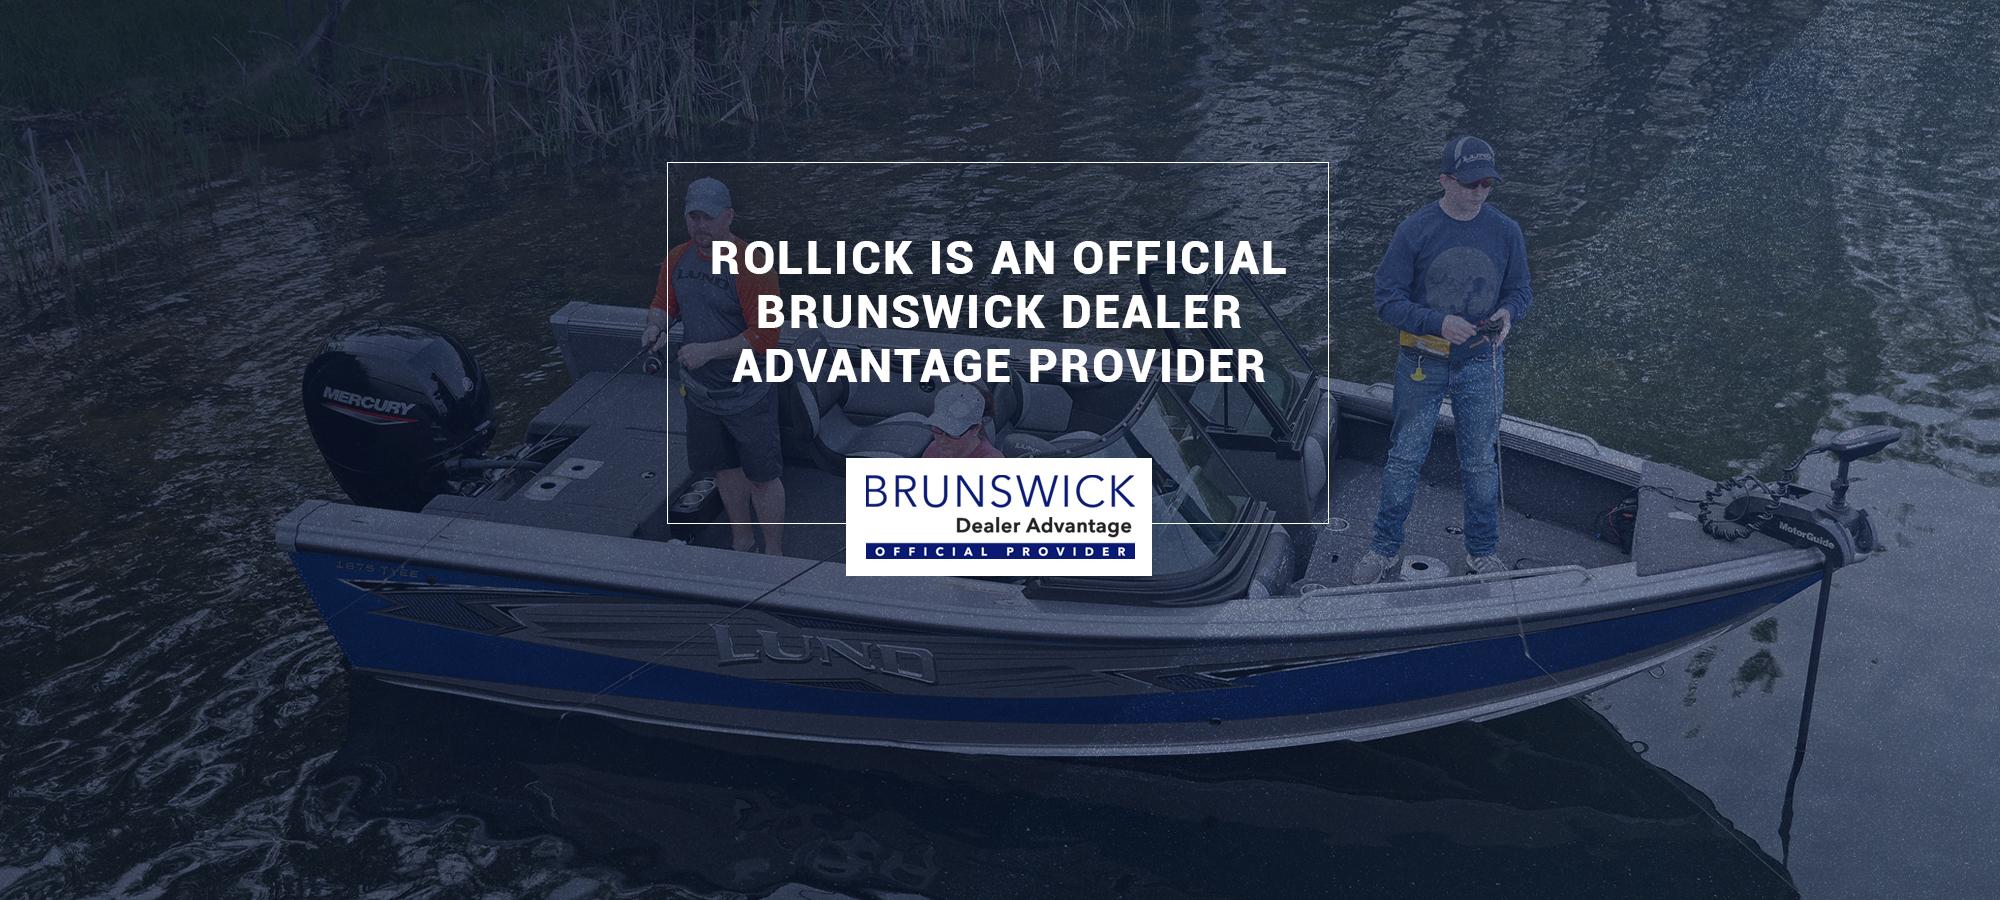 Rollick News